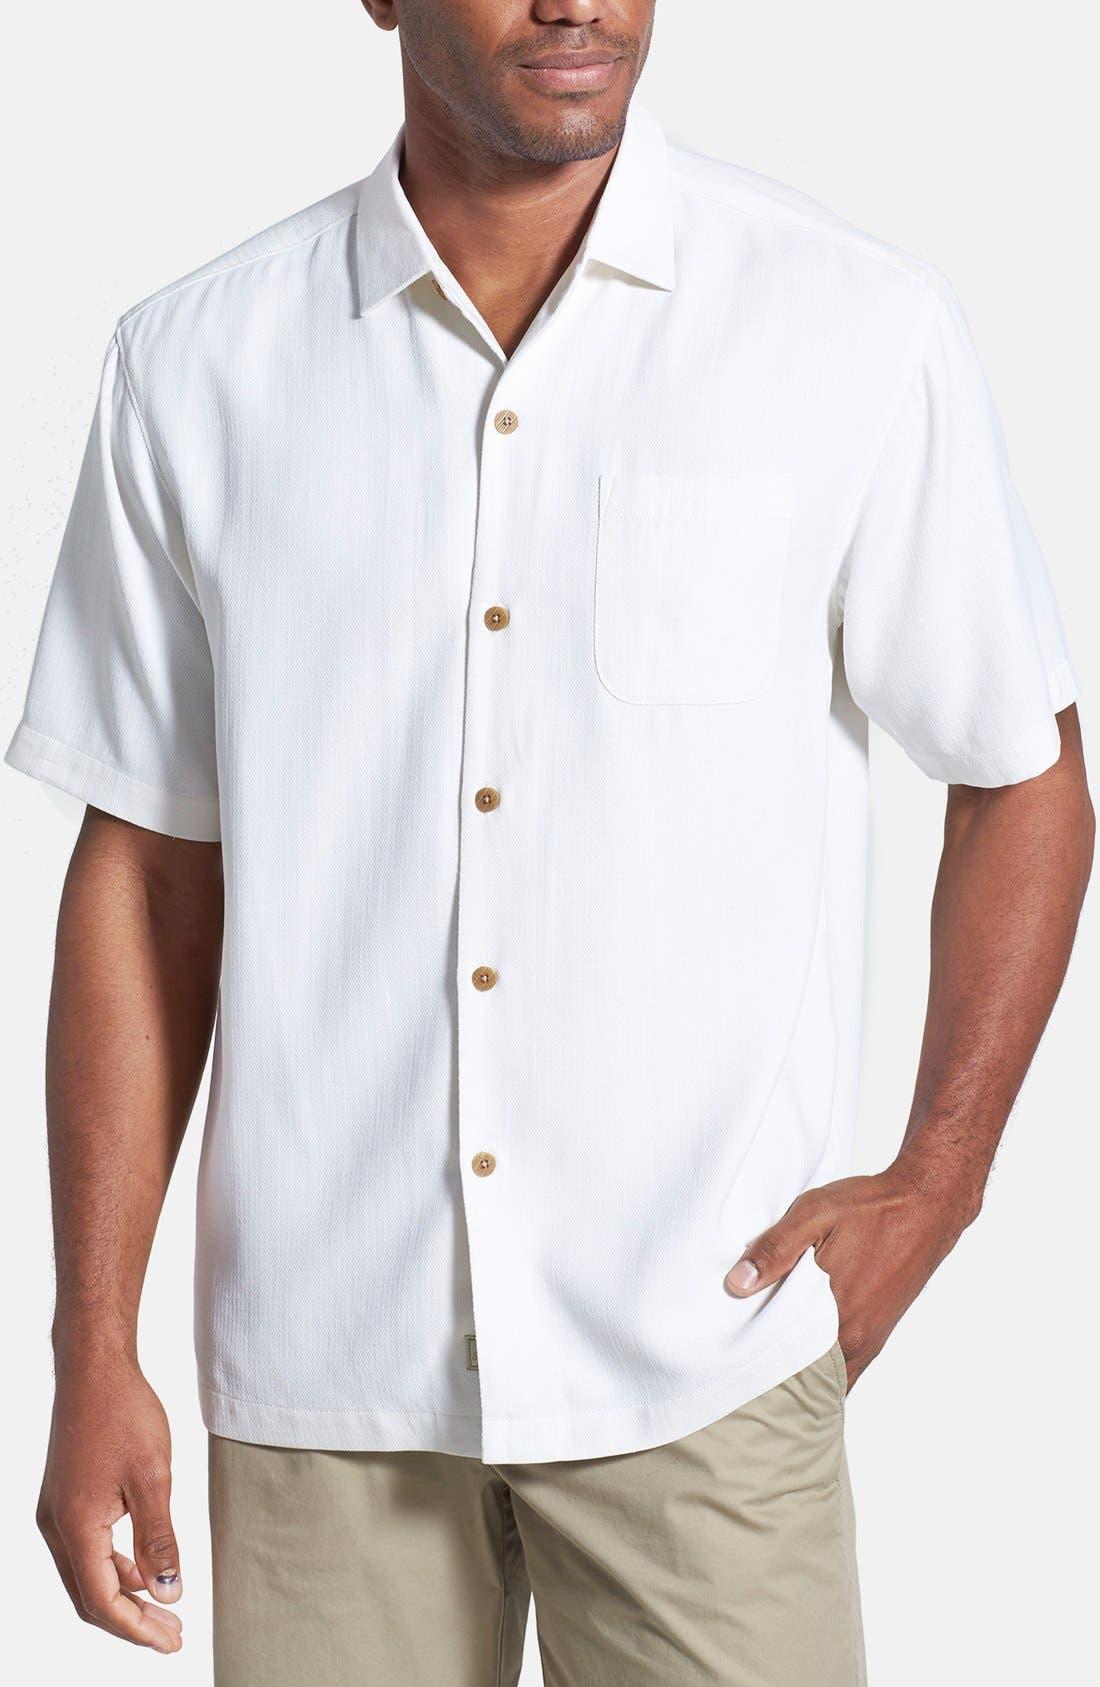 Alternate Image 1 Selected - Tommy Bahama 'Isla Diamond' Original Fit Silk Camp Shirt